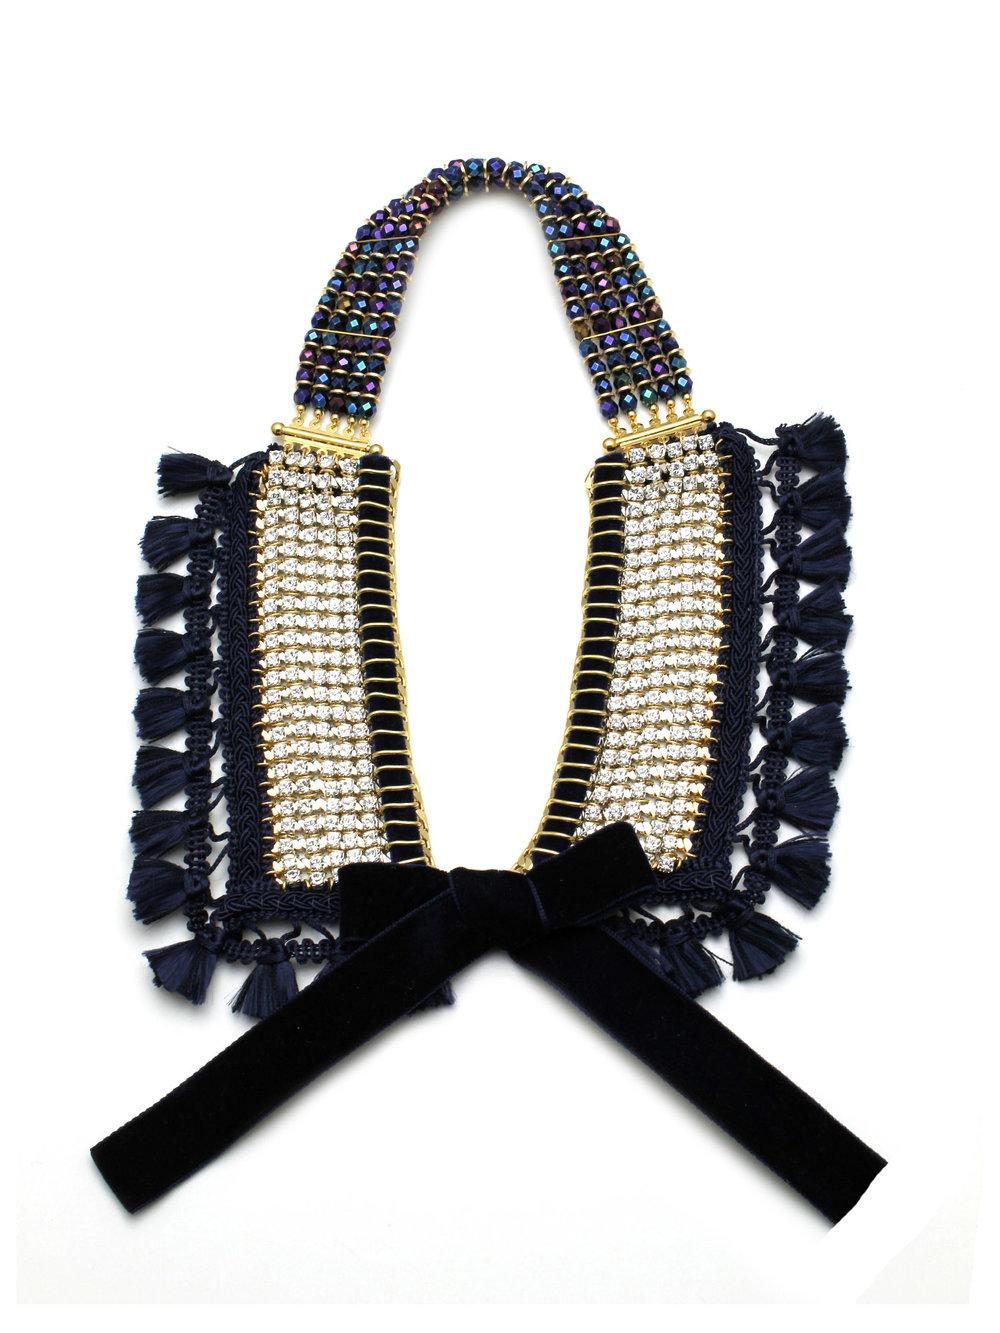 044 - Crystal Tassel Collar.jpg